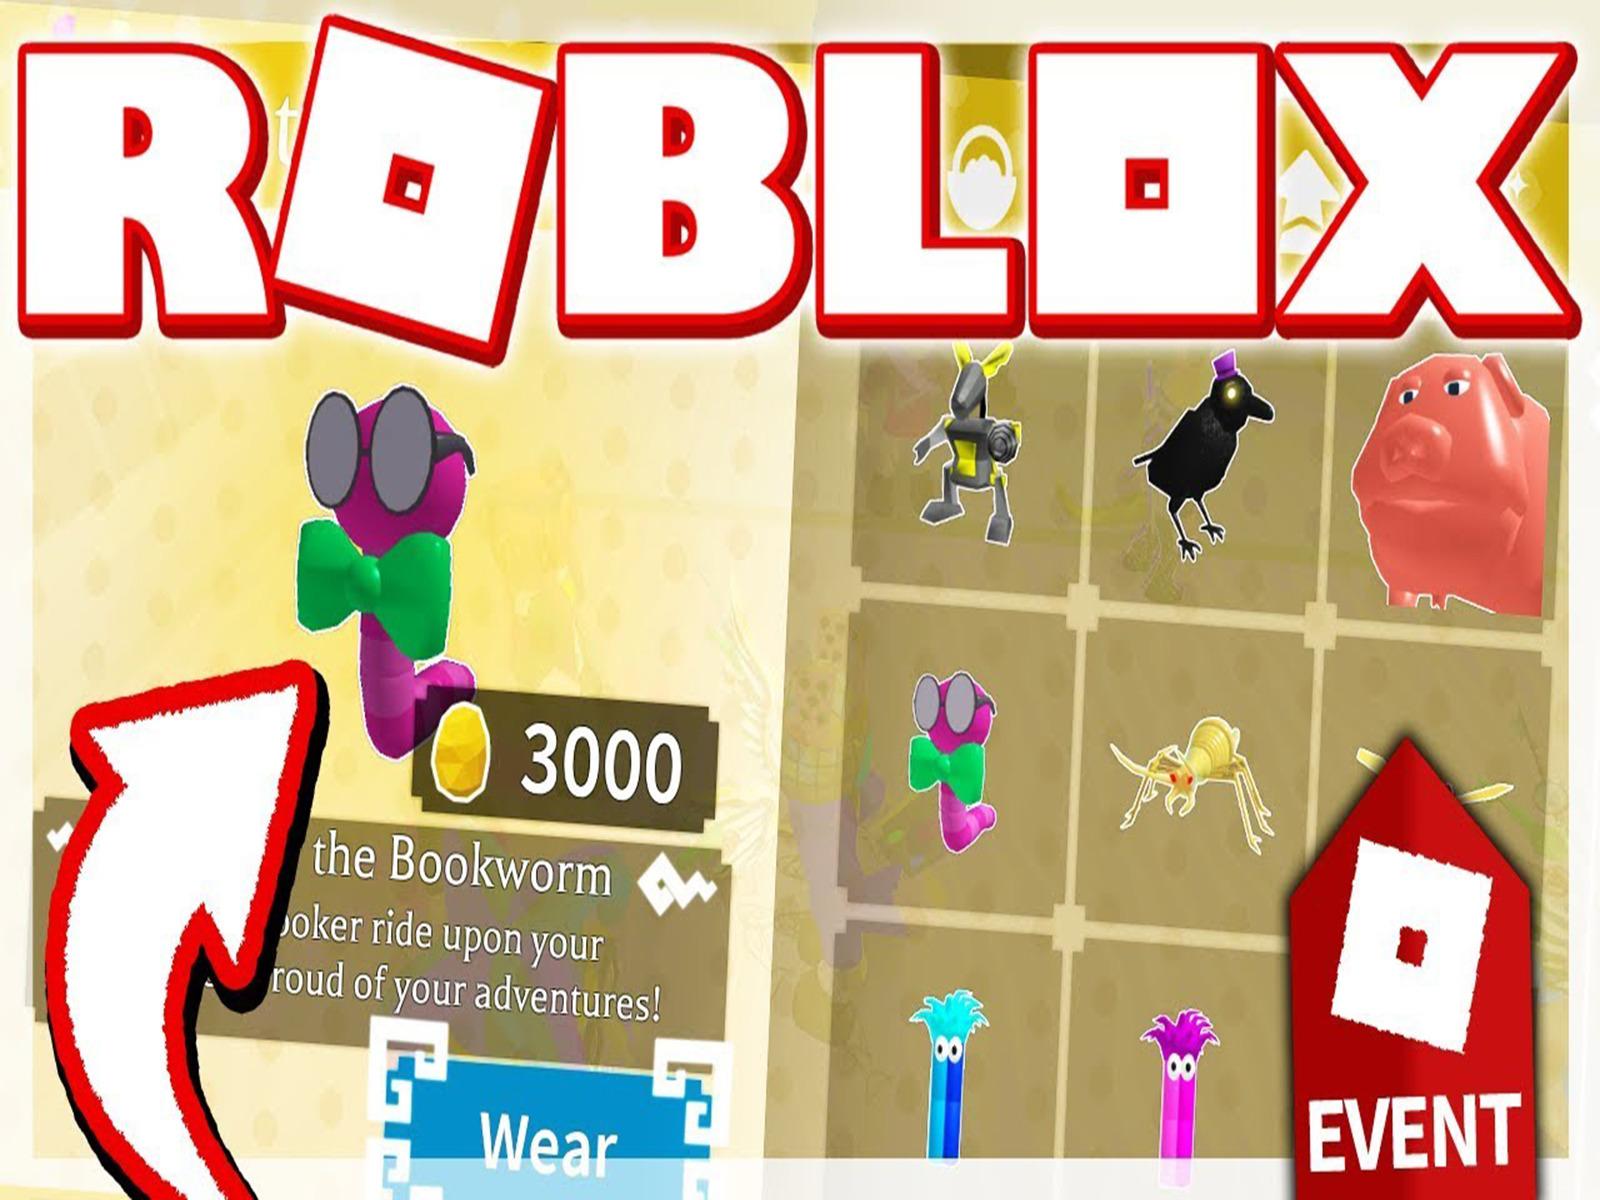 Roblox Event Items 2018 Leaked Prime Video Clip Twiistedpandora